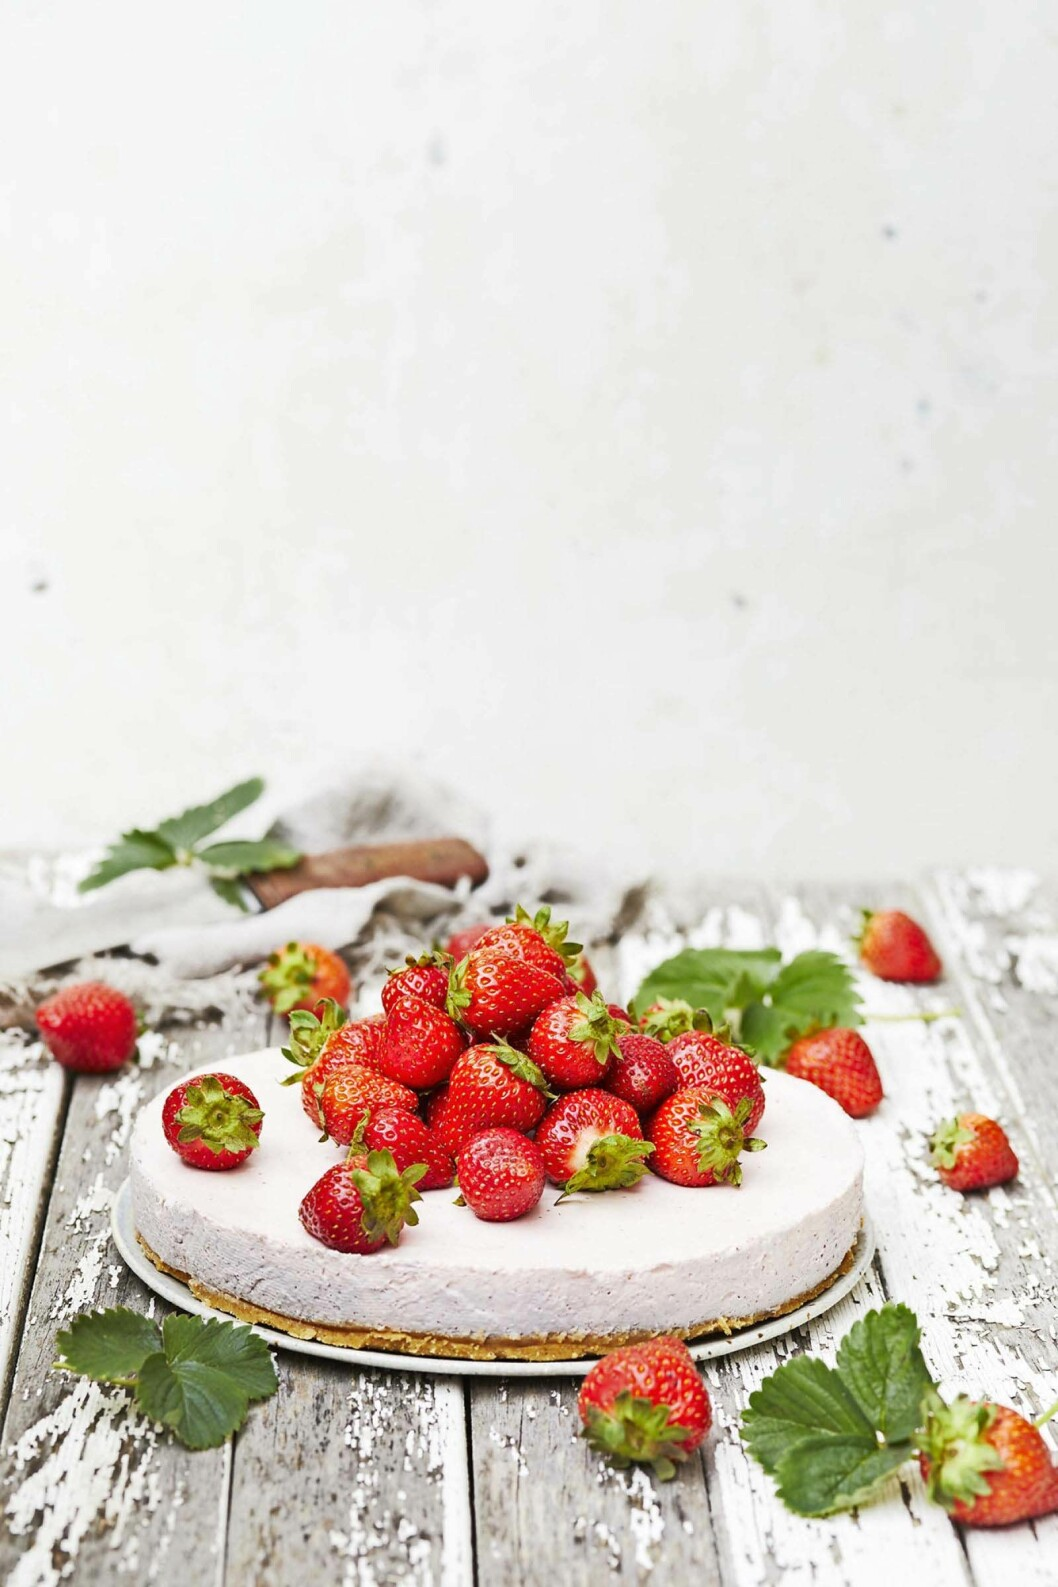 Recept på jordgubbscheesecake